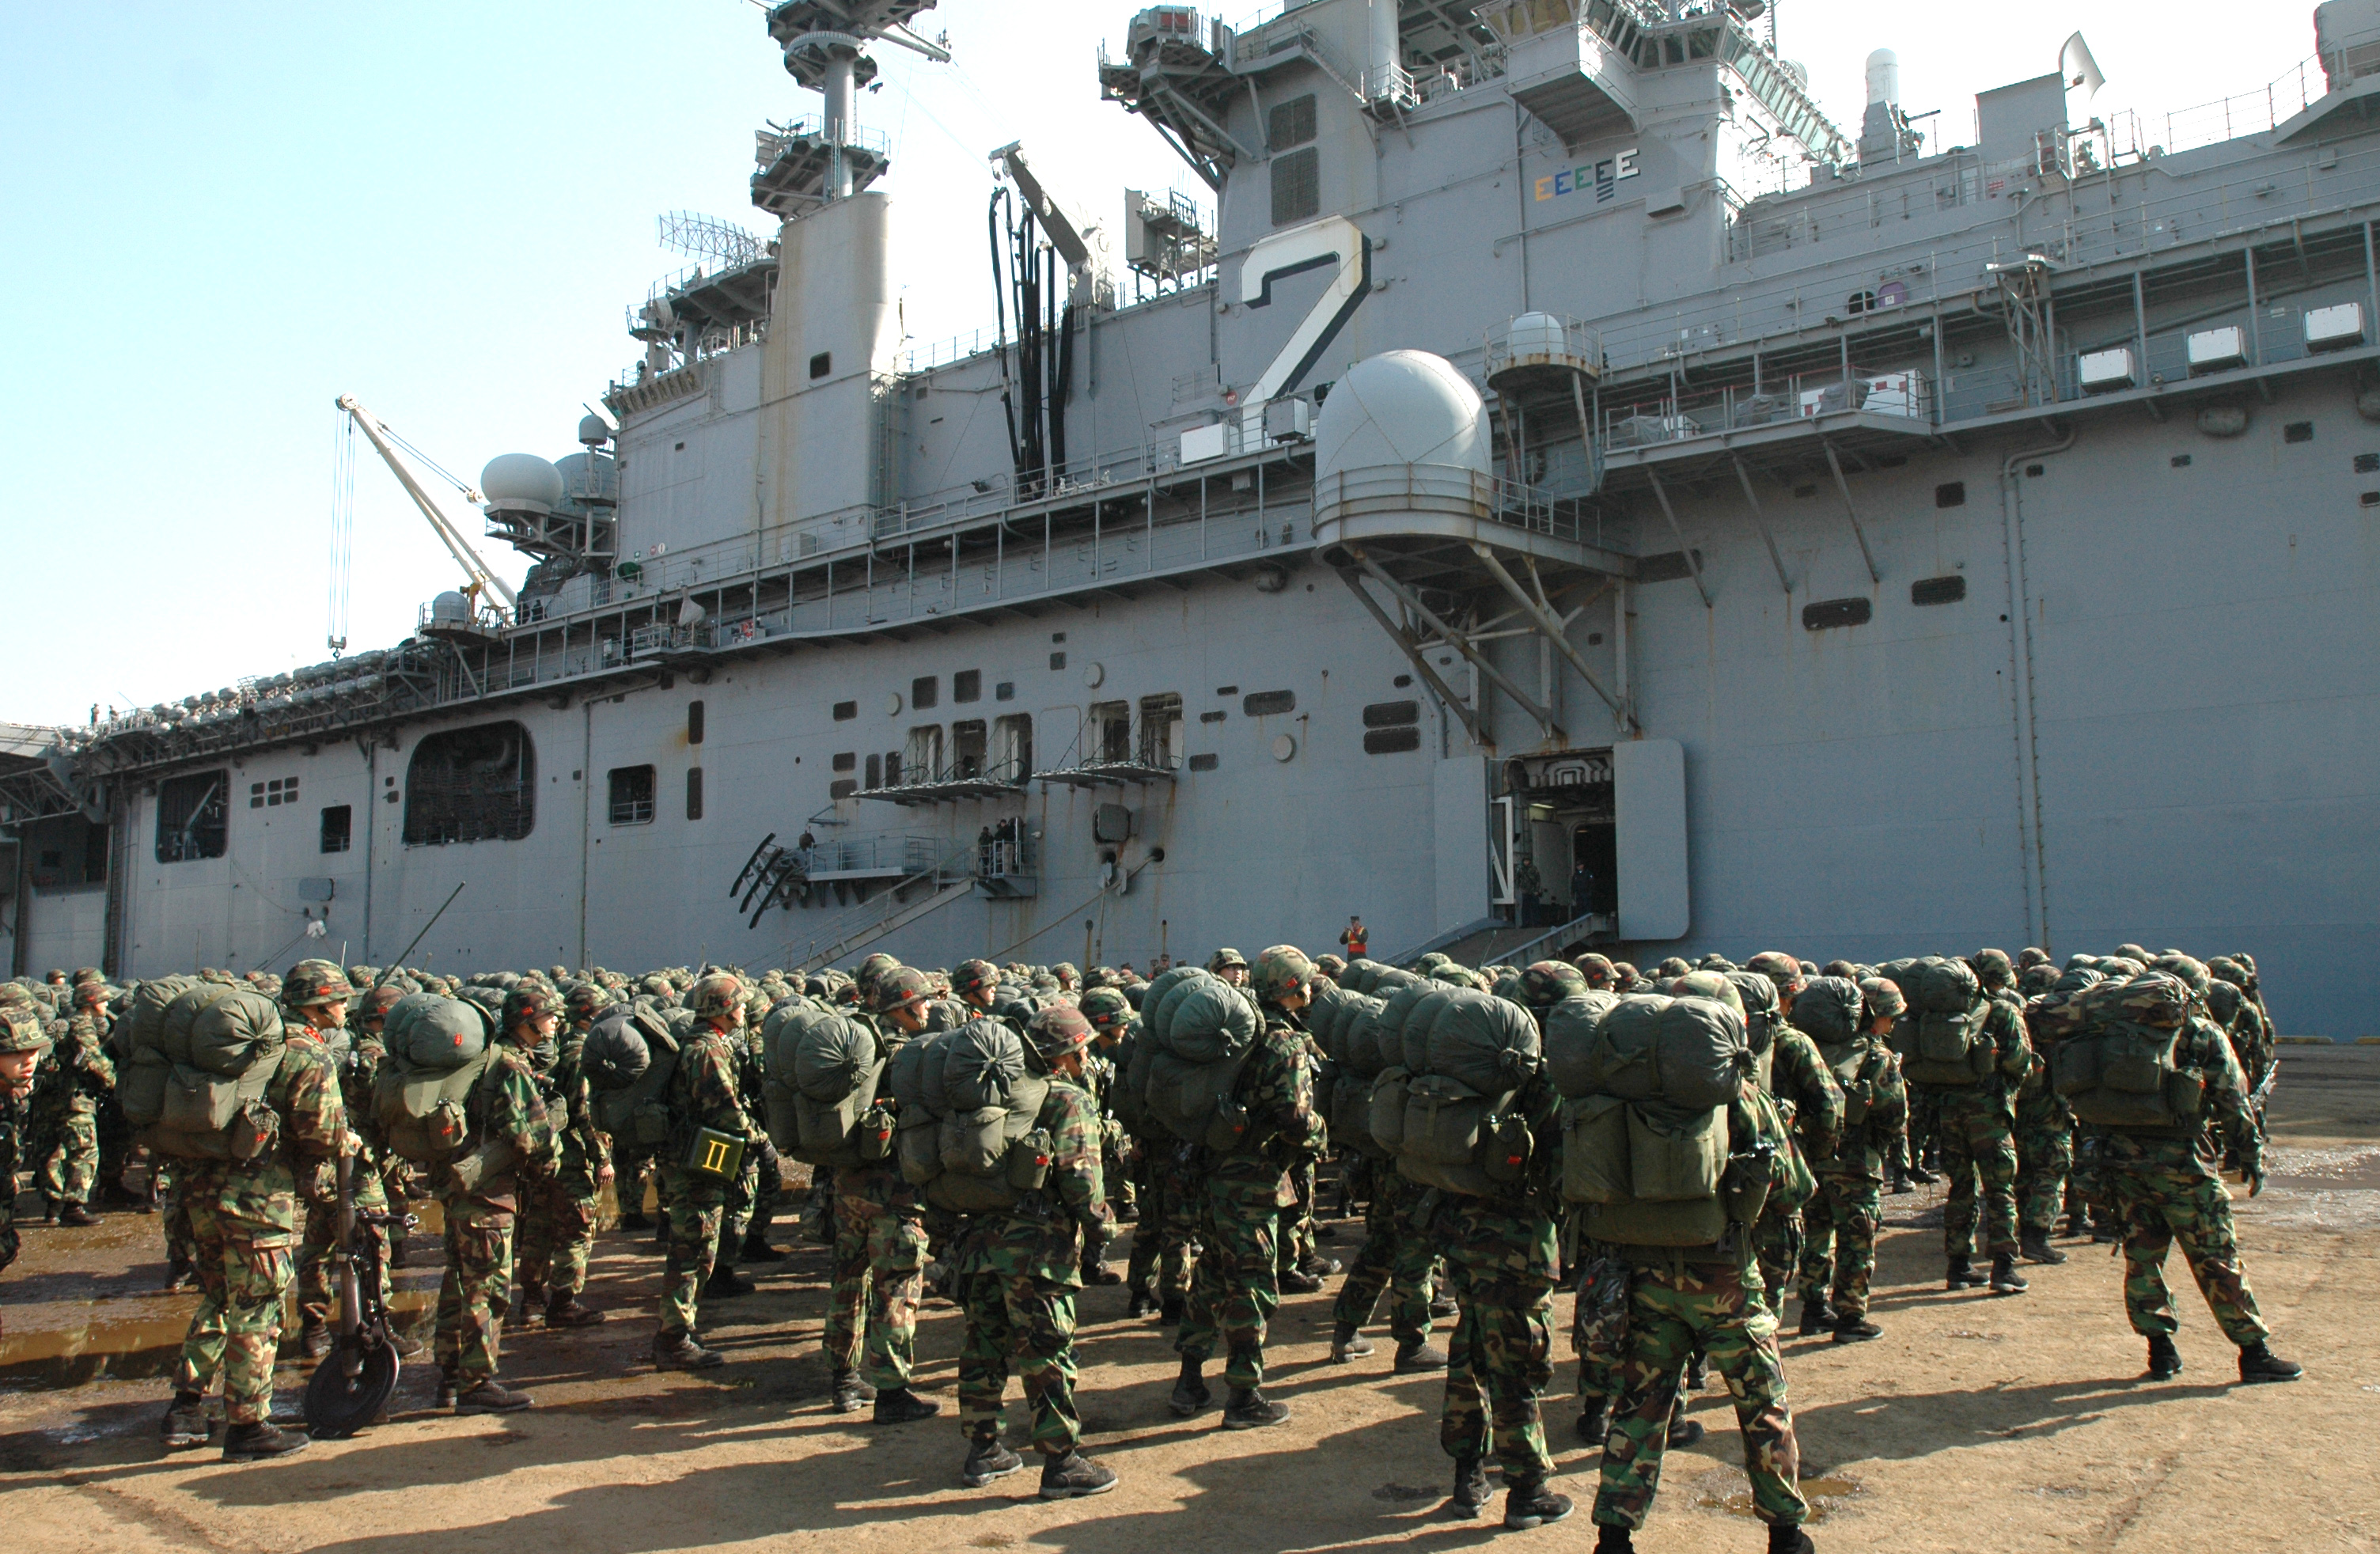 Republic of Korea Marine Corps | Military Wiki | FANDOM powered by Wikia